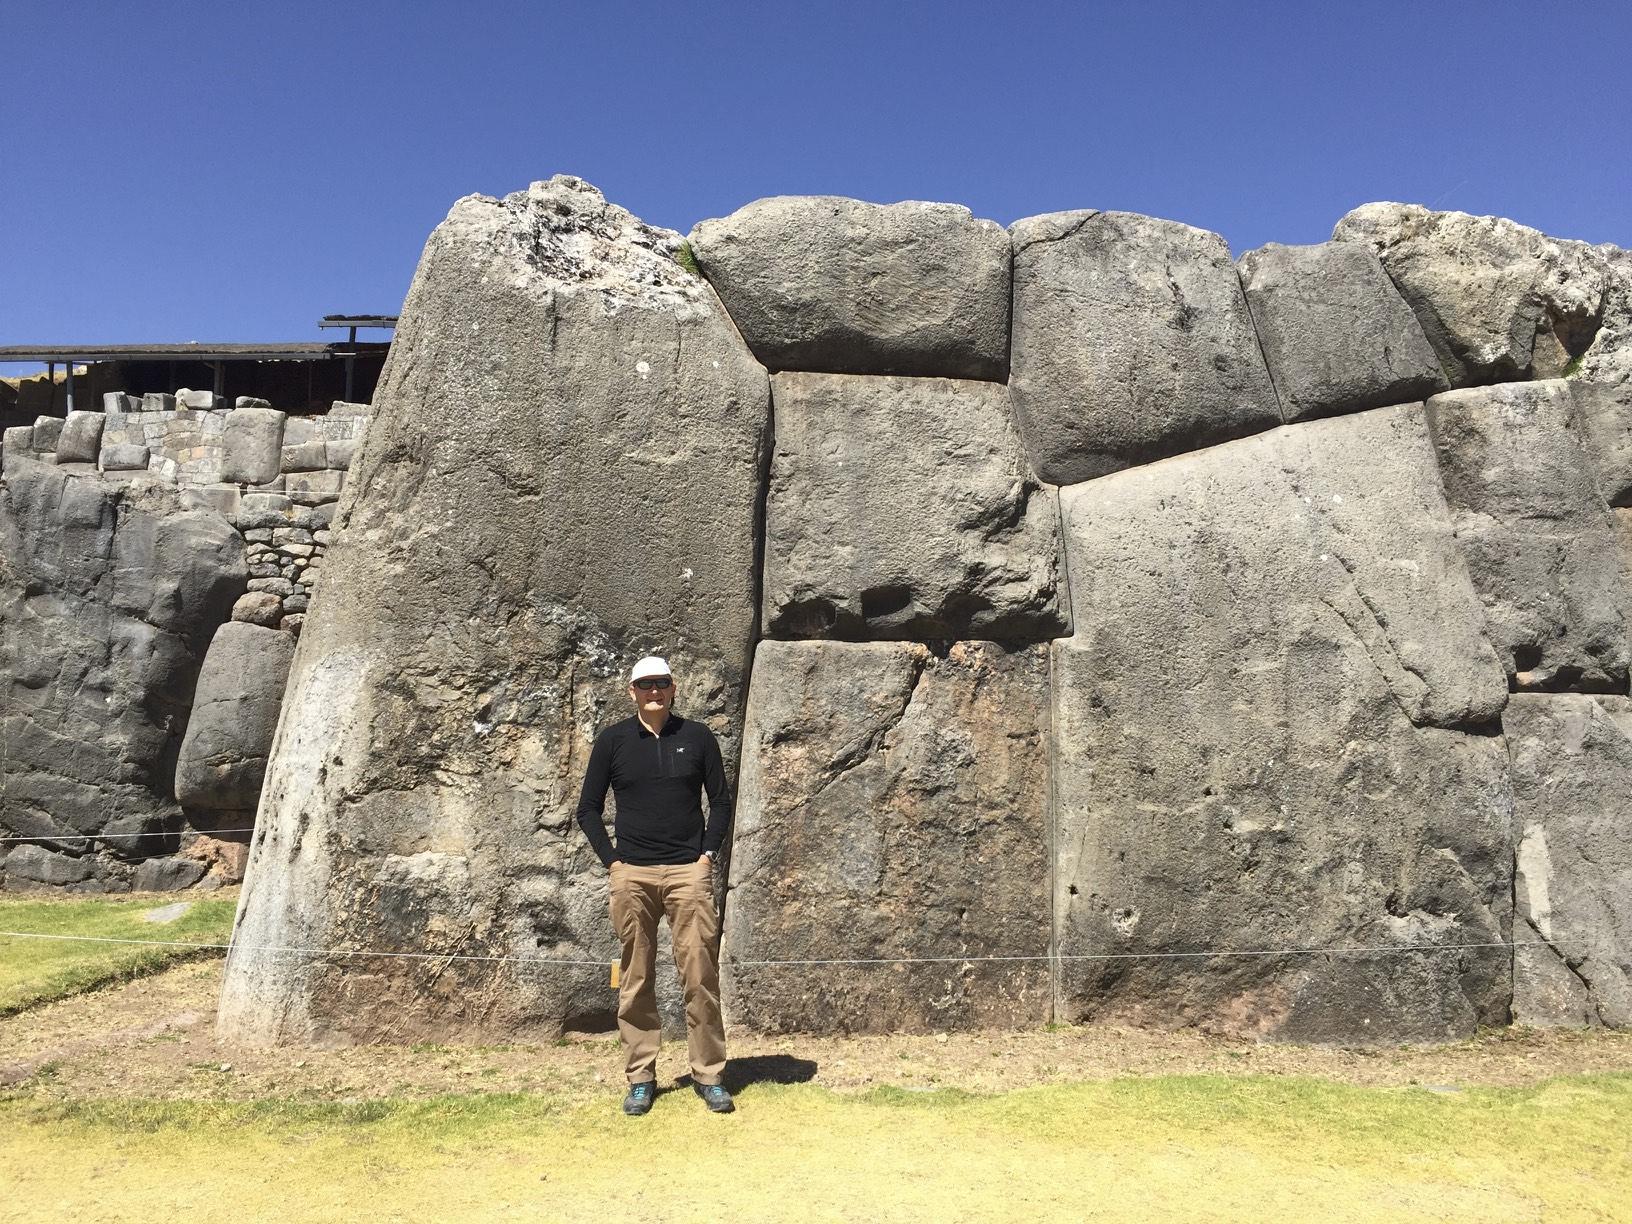 The monolithic walls of Saksaywaman